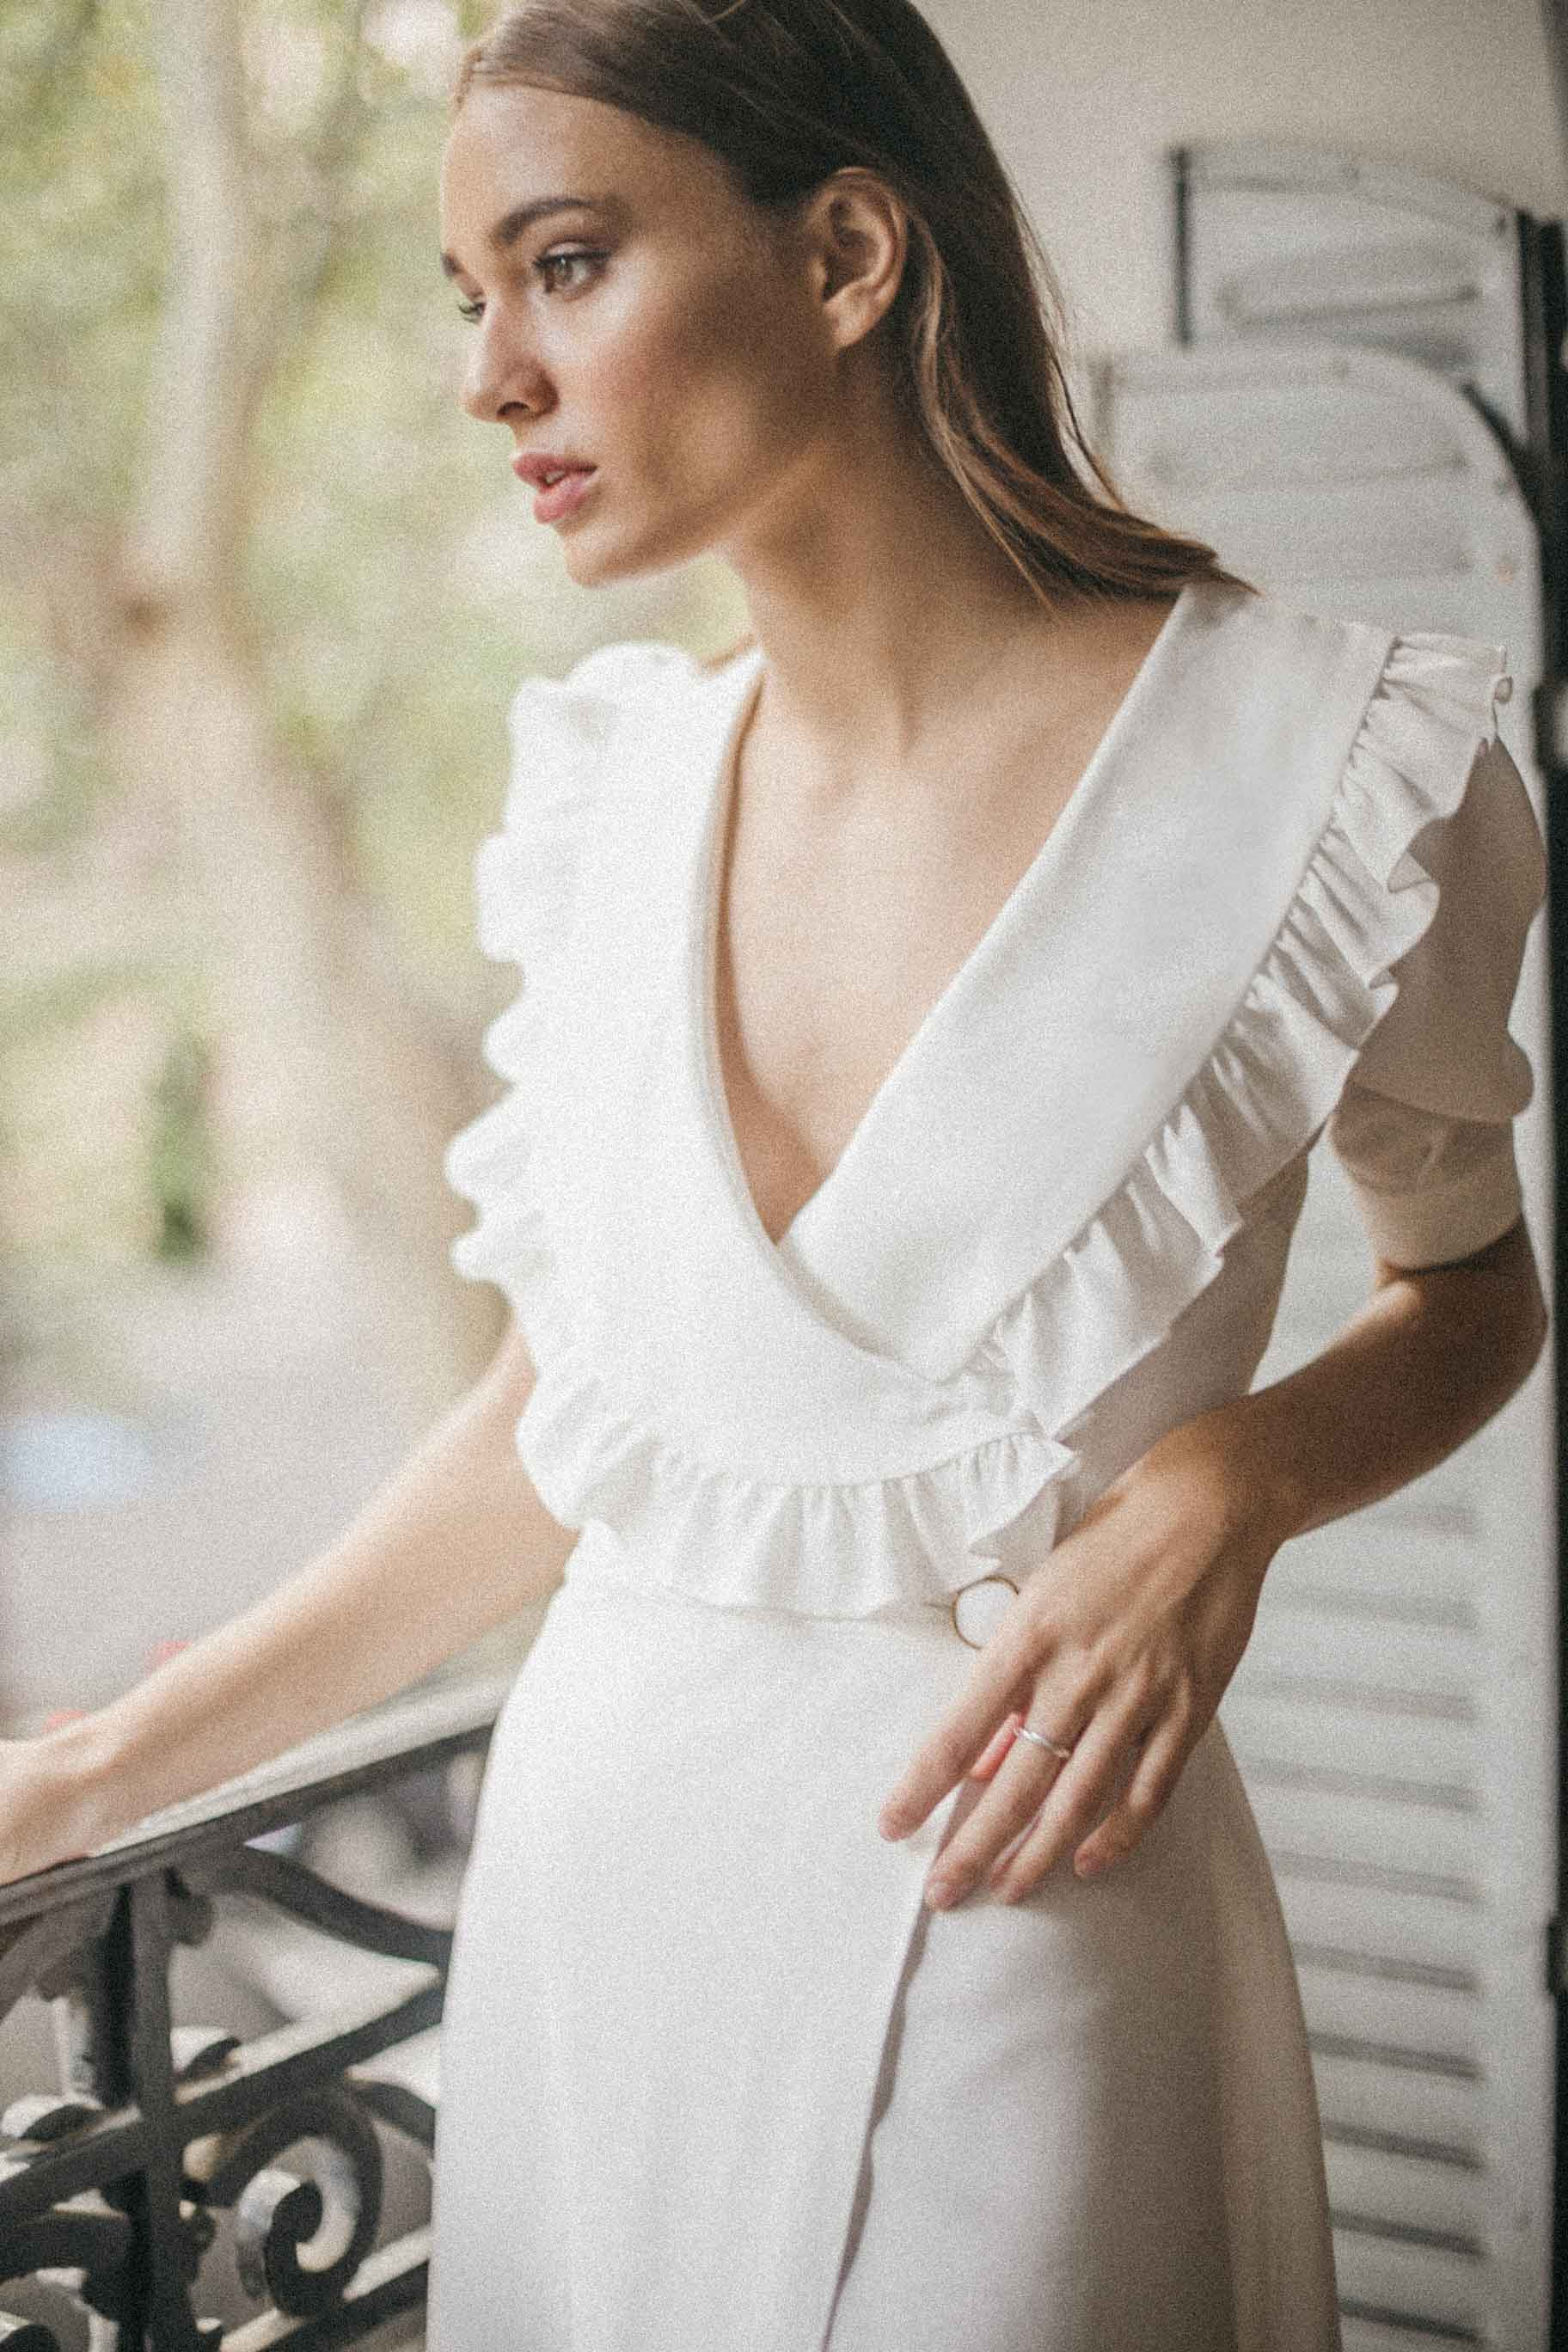 Colección Vestidos de Novia Cherubina: Danseuse